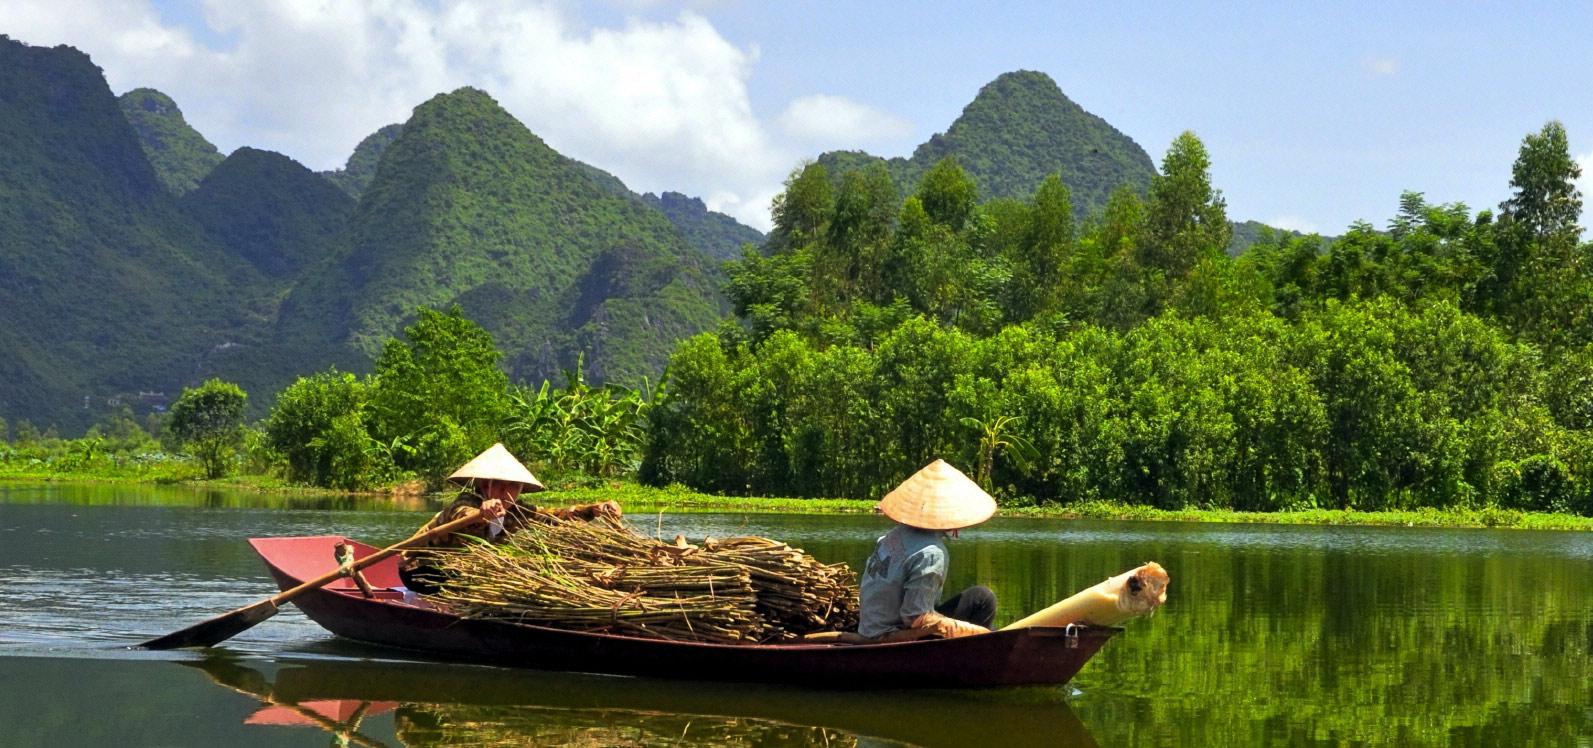 Uroki Wietnamu